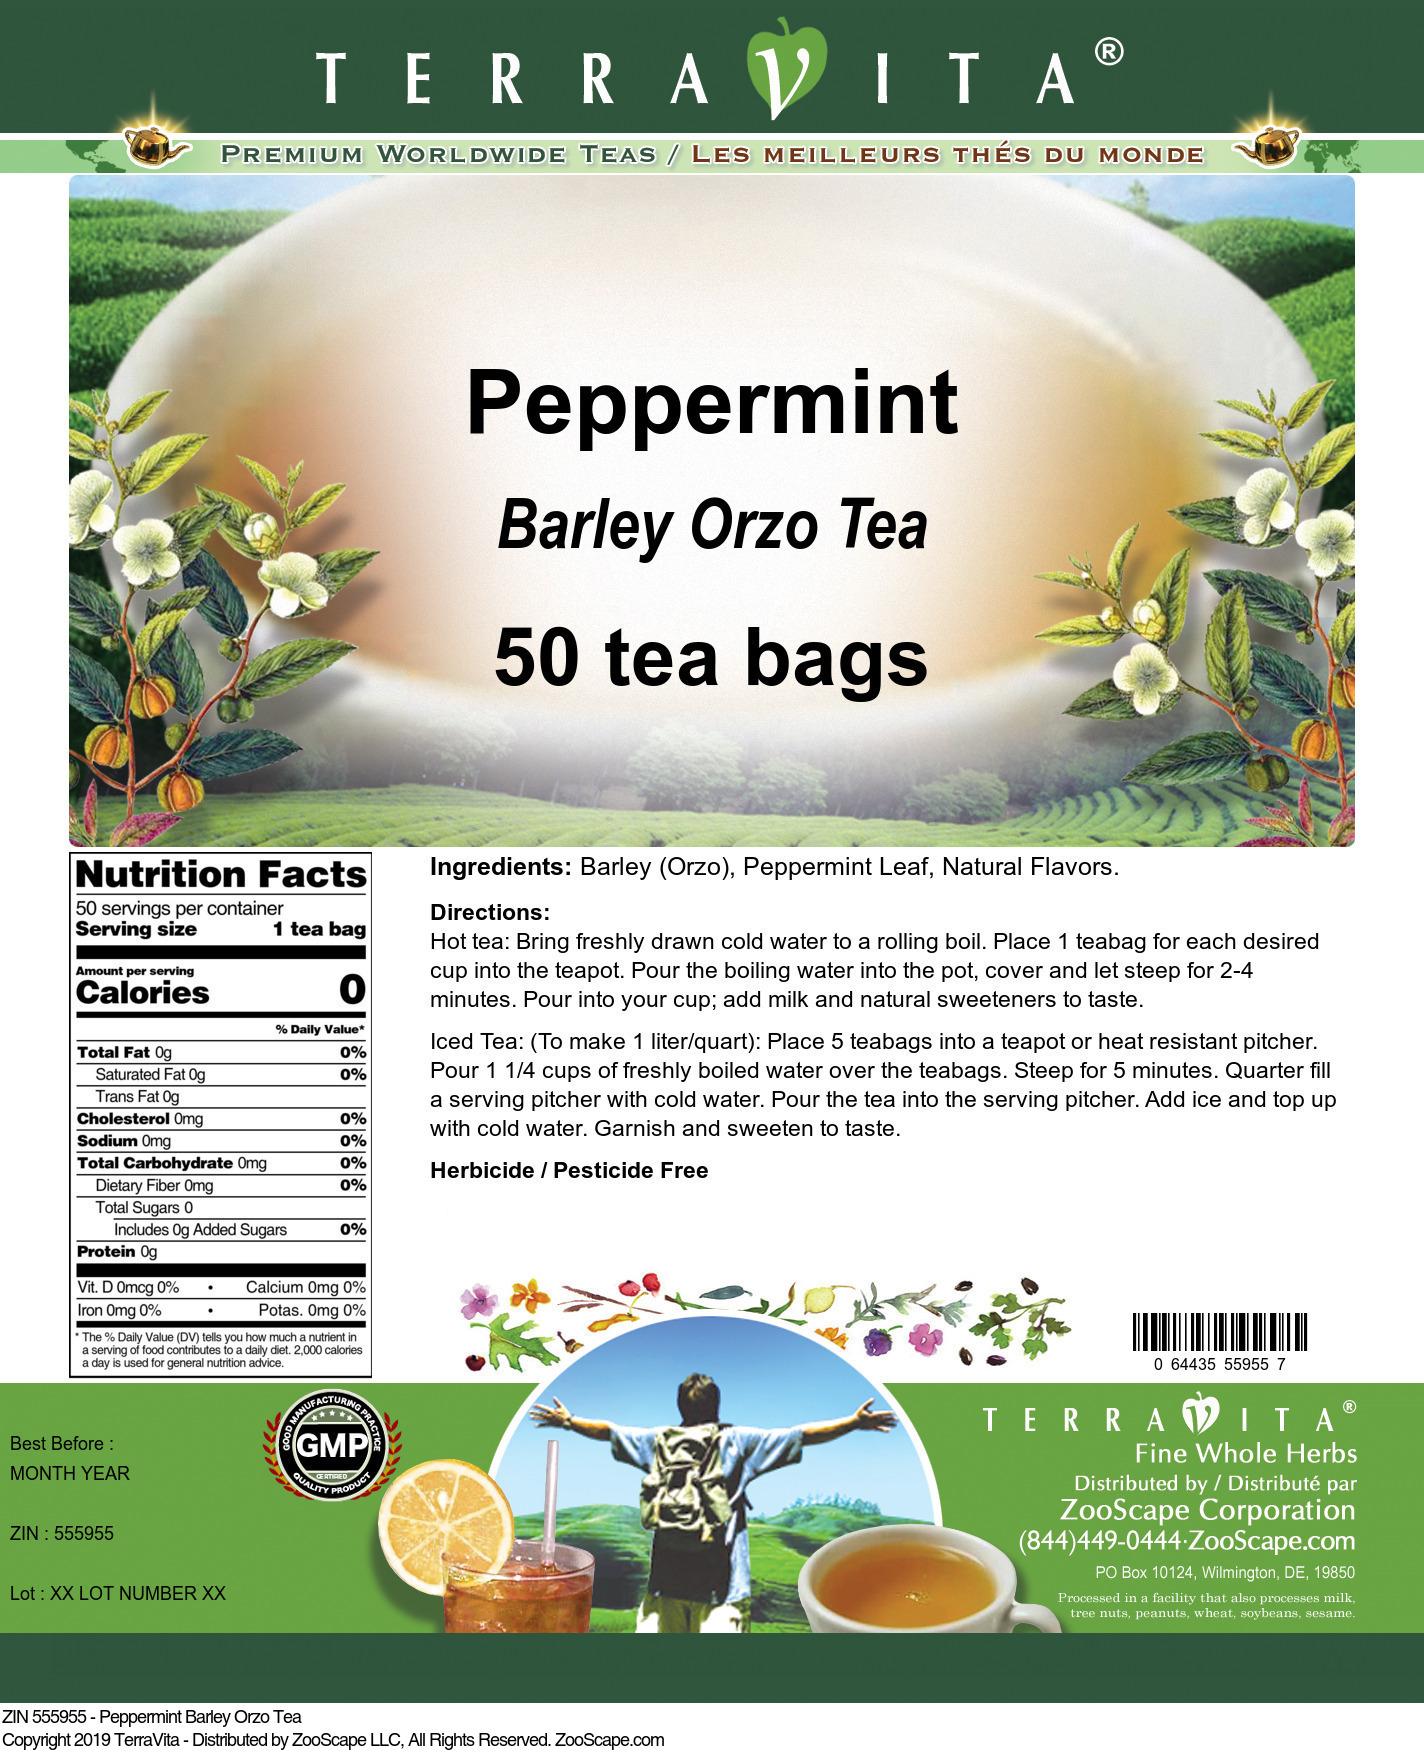 Peppermint Barley Orzo Tea